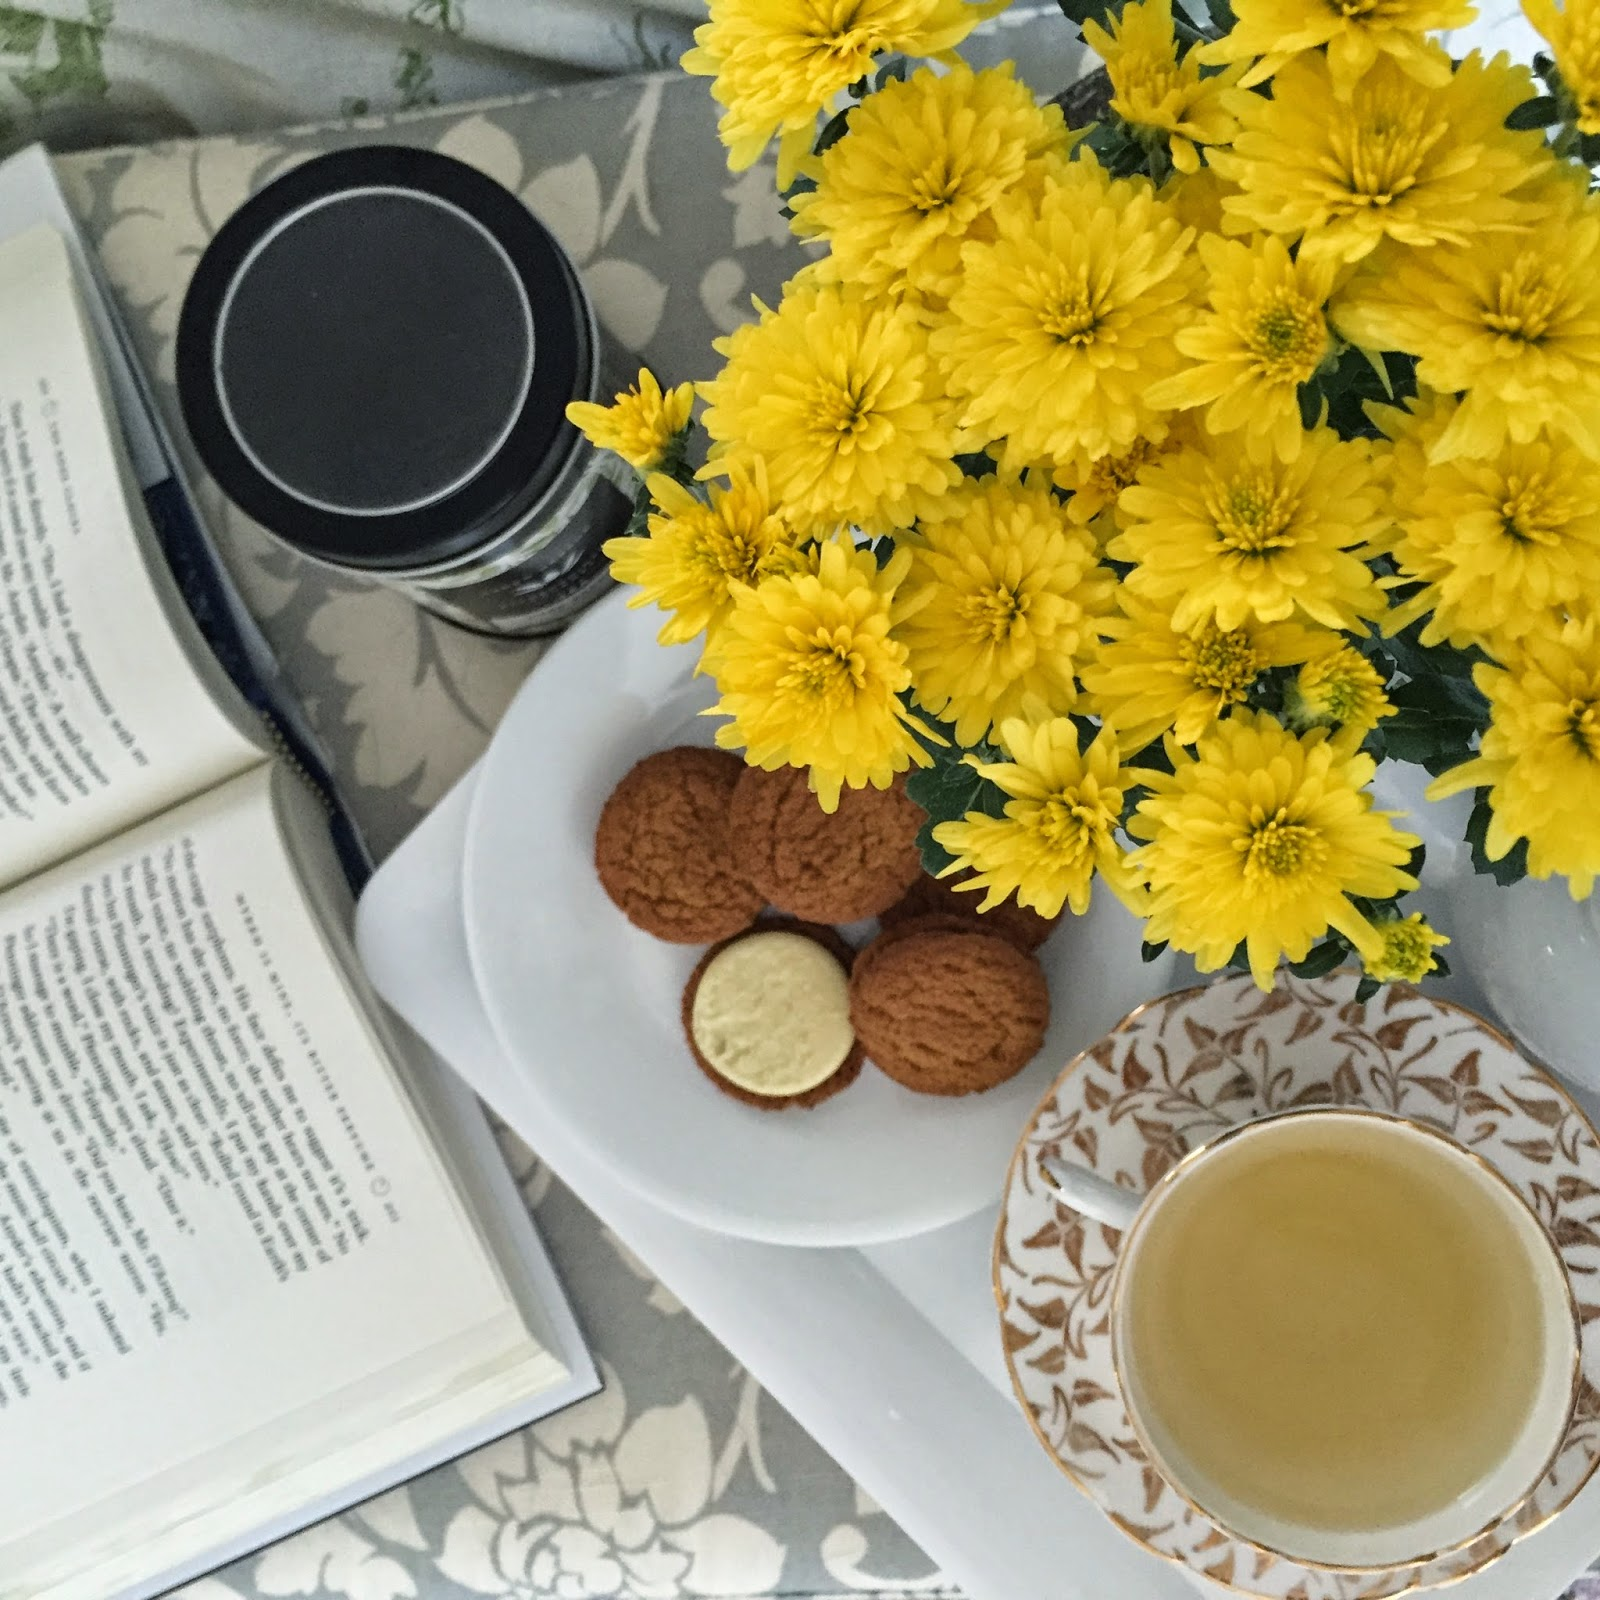 Mint And Perilla: Extraordinary Desserts Pure Green Tea